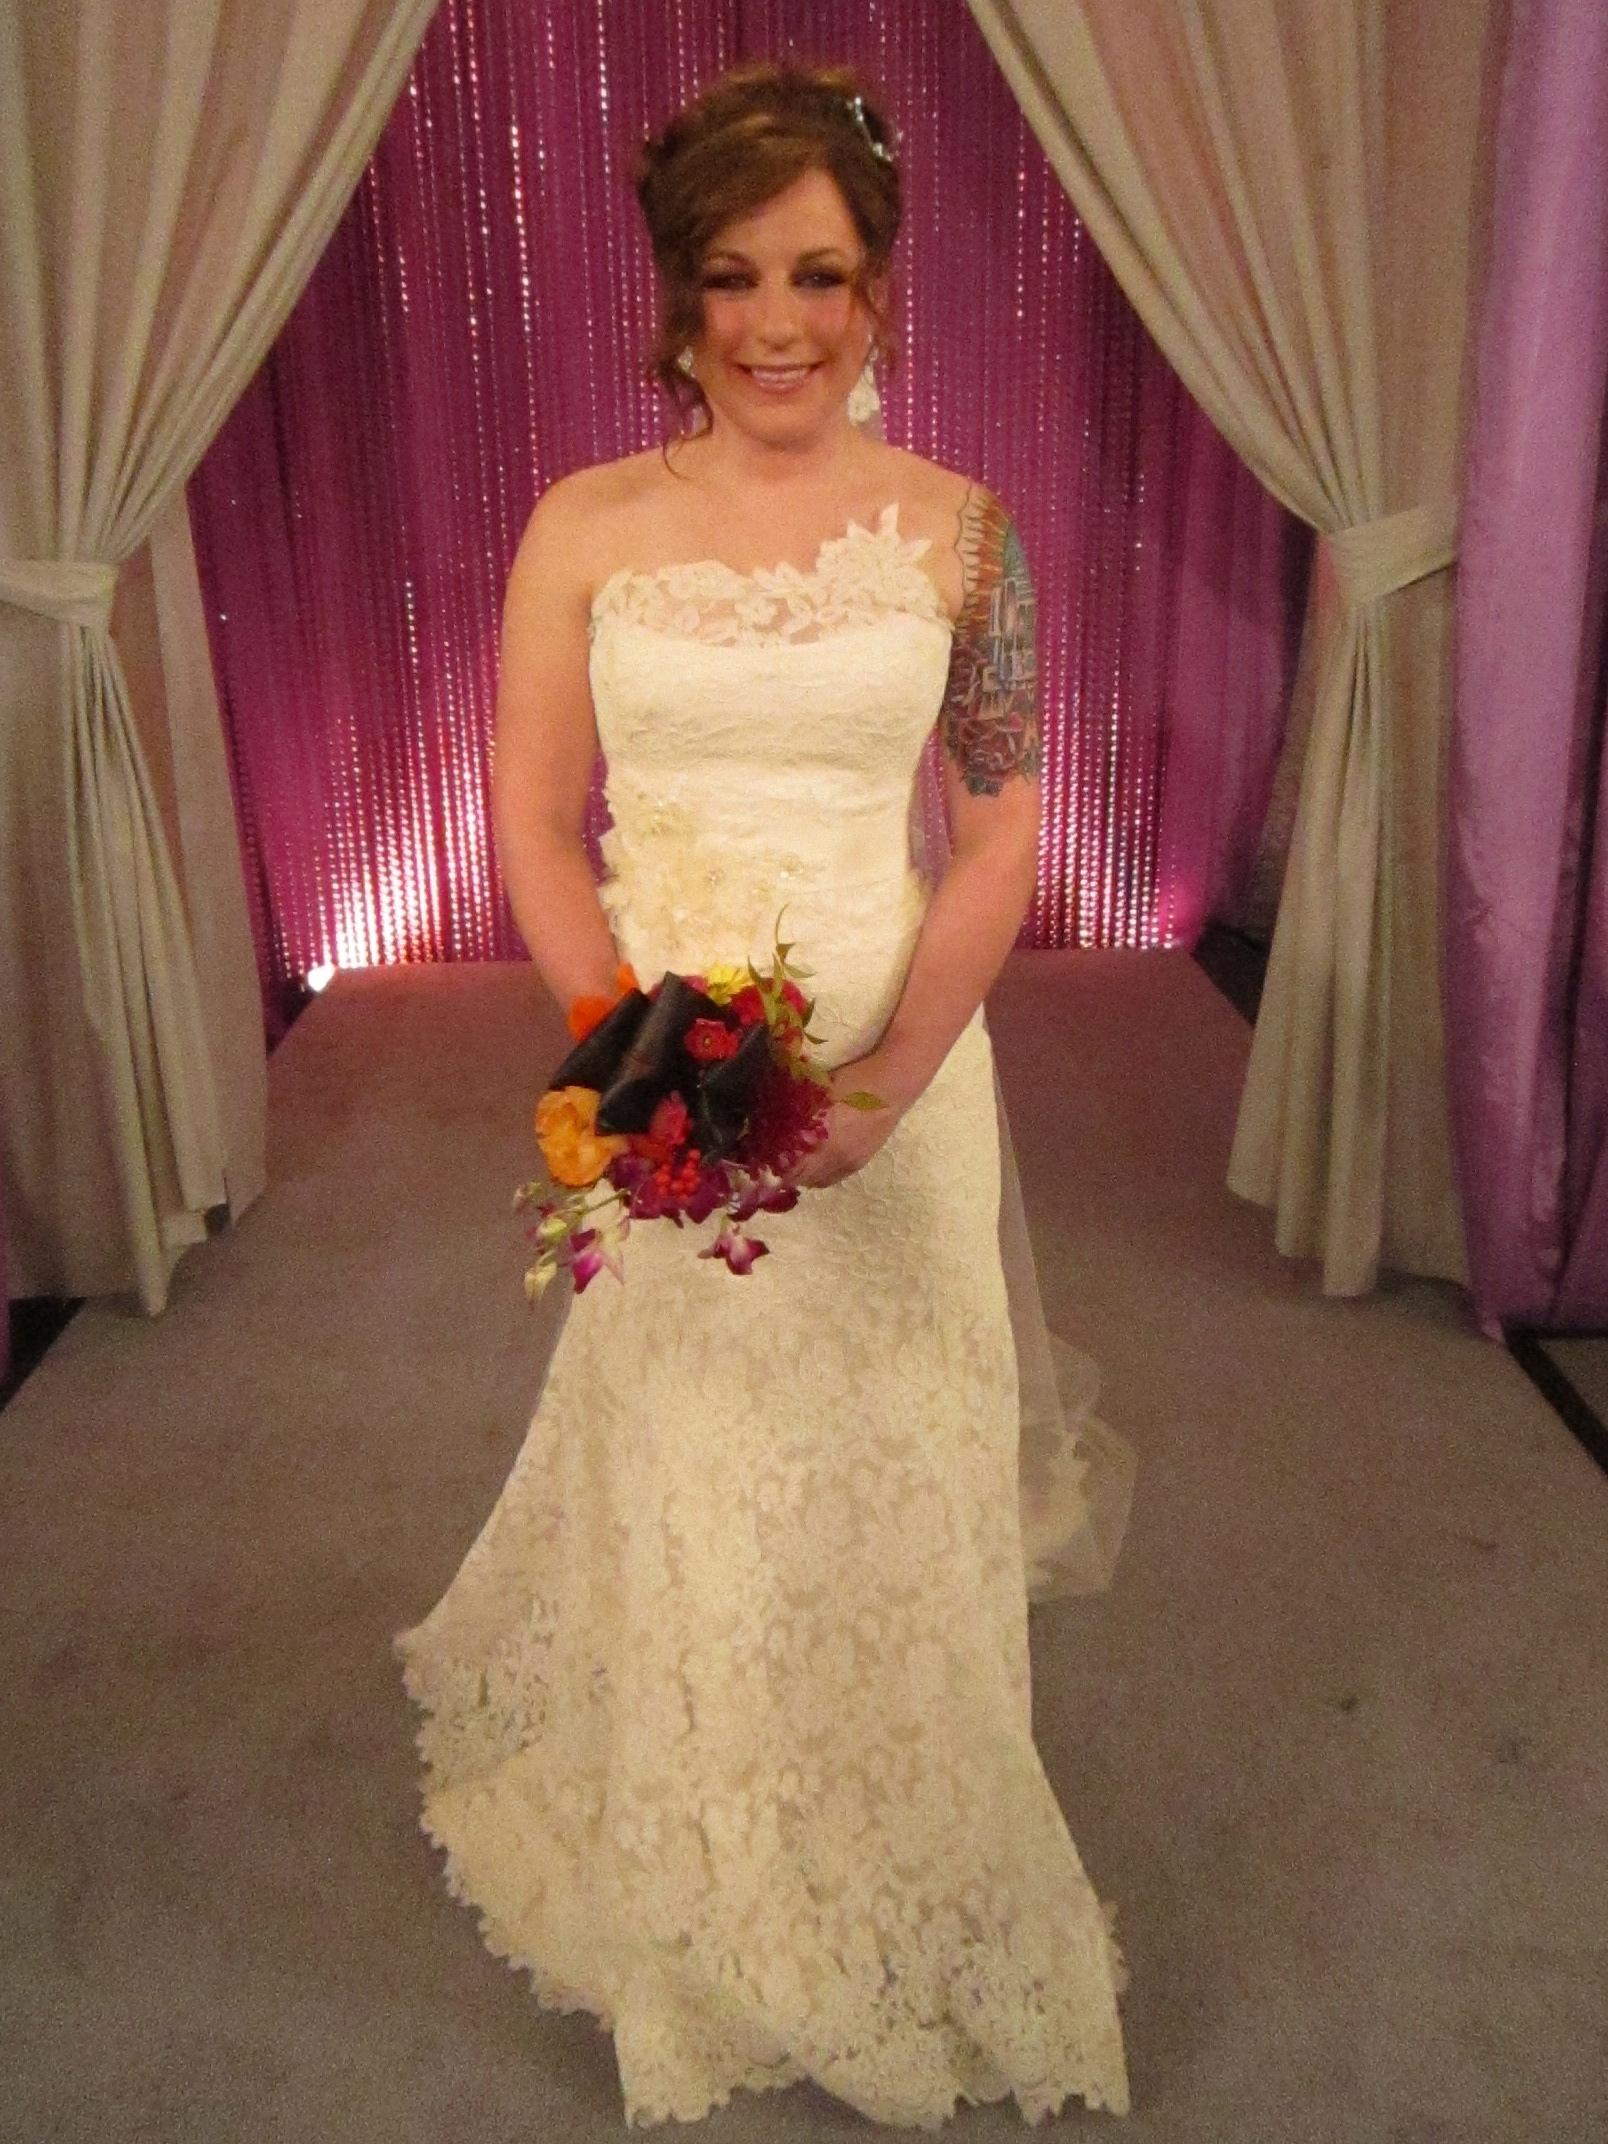 Randy fenoli randy fenoli blog for Wedding dresses for tomboy brides